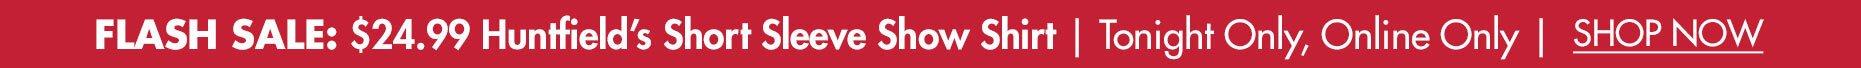 Flash Sale: $24.99 Huntfield's® Short Sleeve Show Shirt